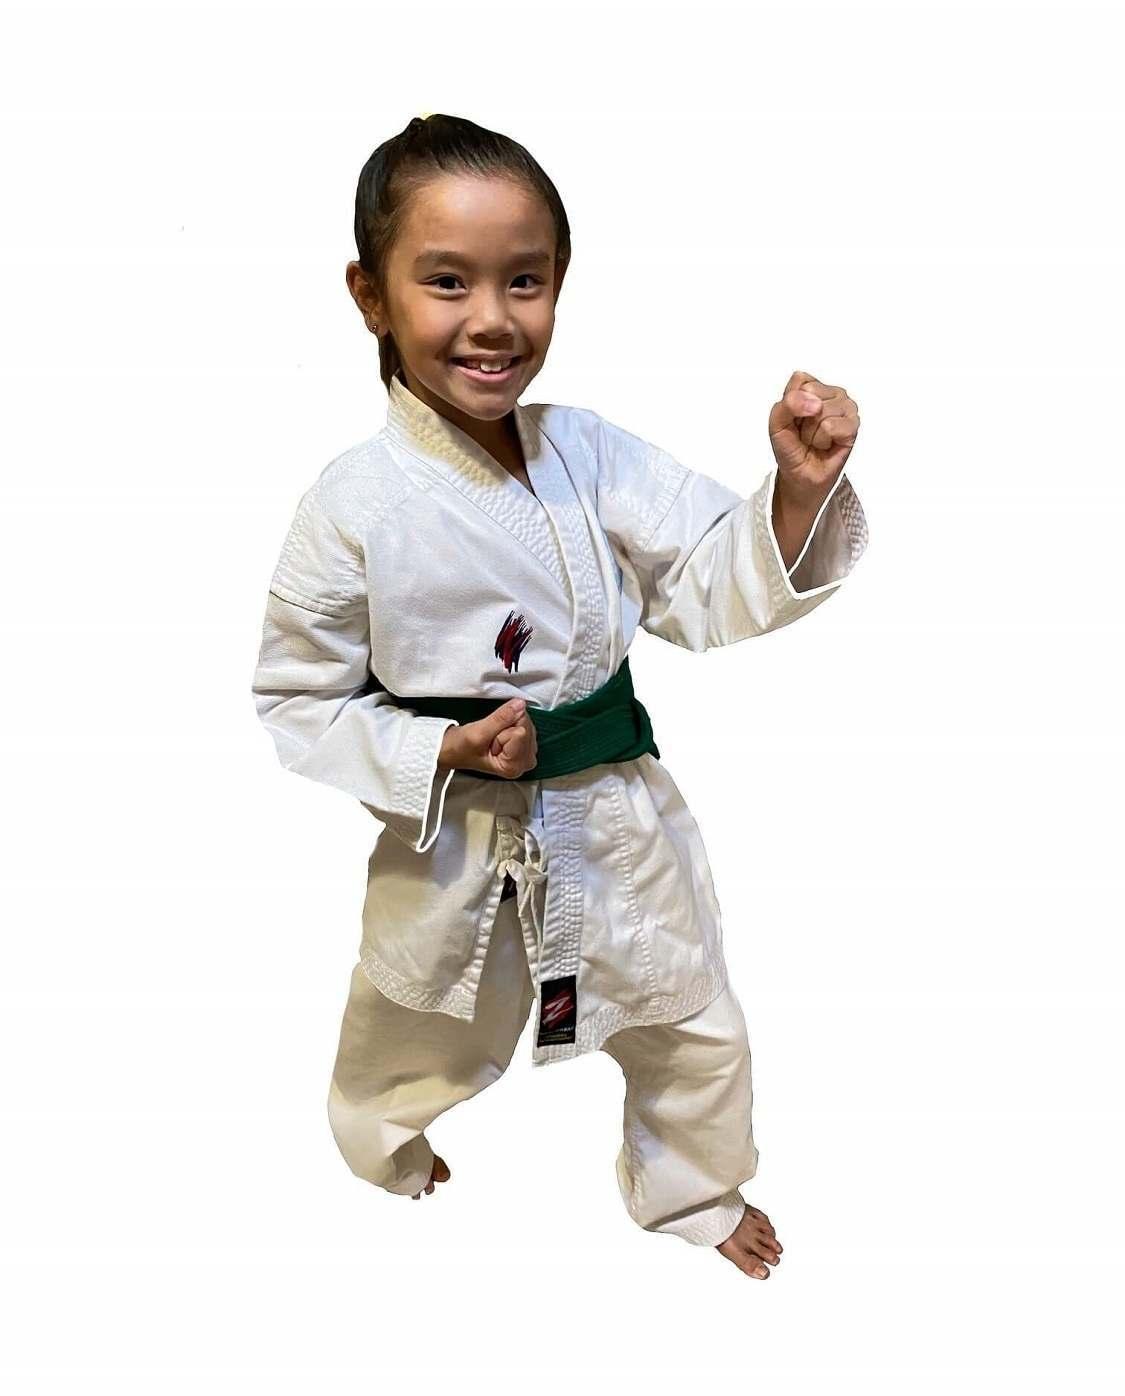 Webp.net Resizeimage, Martial Arts Advantage Tampa FL